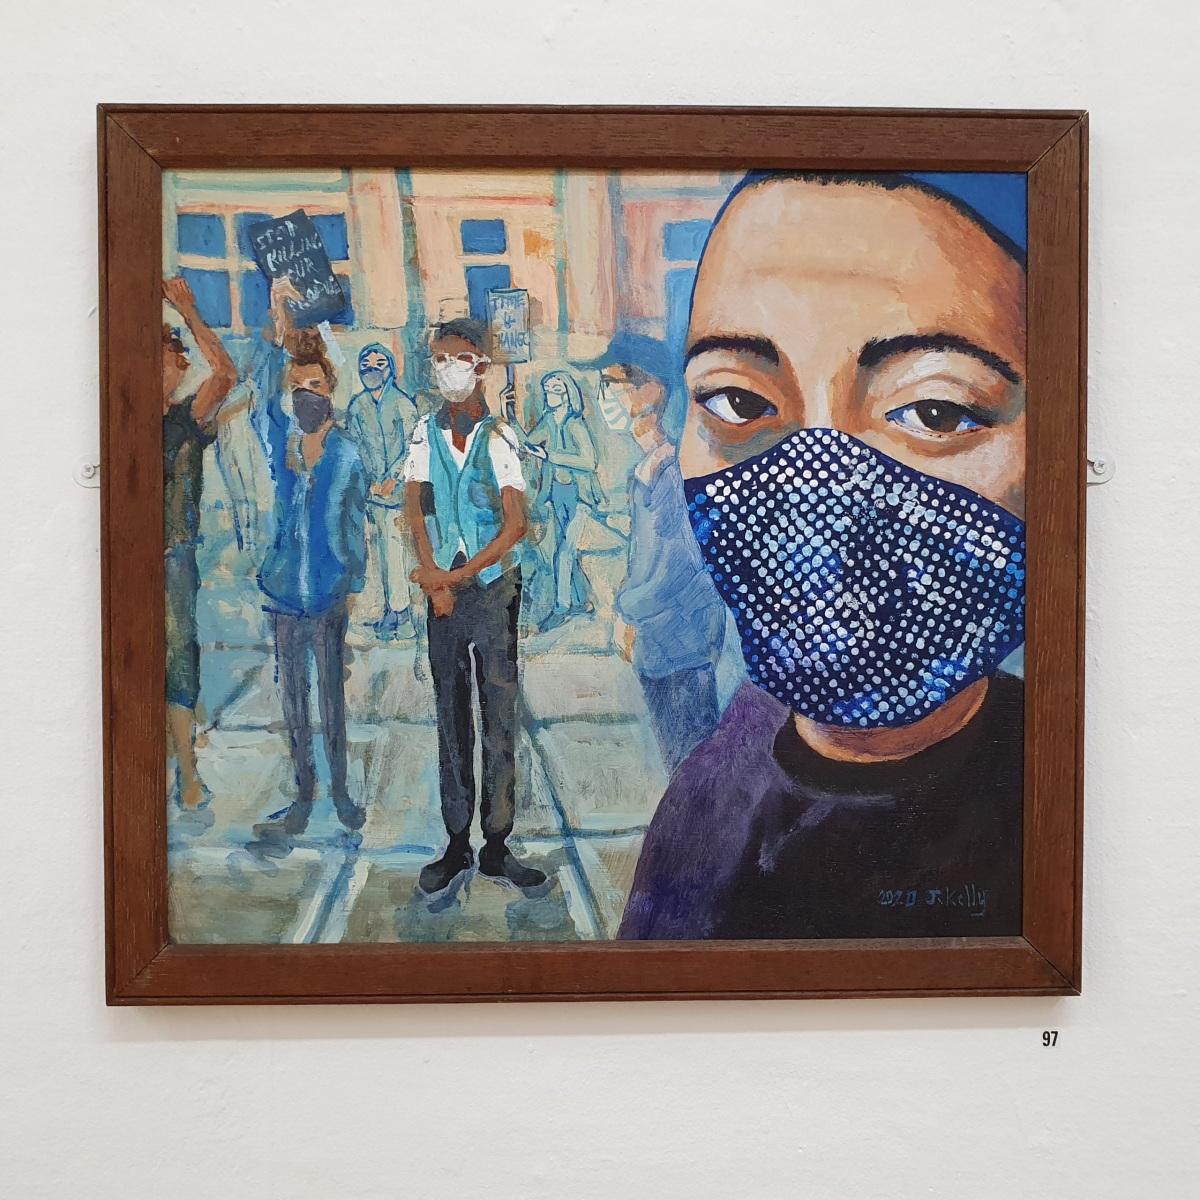 Artist Josie Kelly shows new work at Peterborough City Gallery 2020